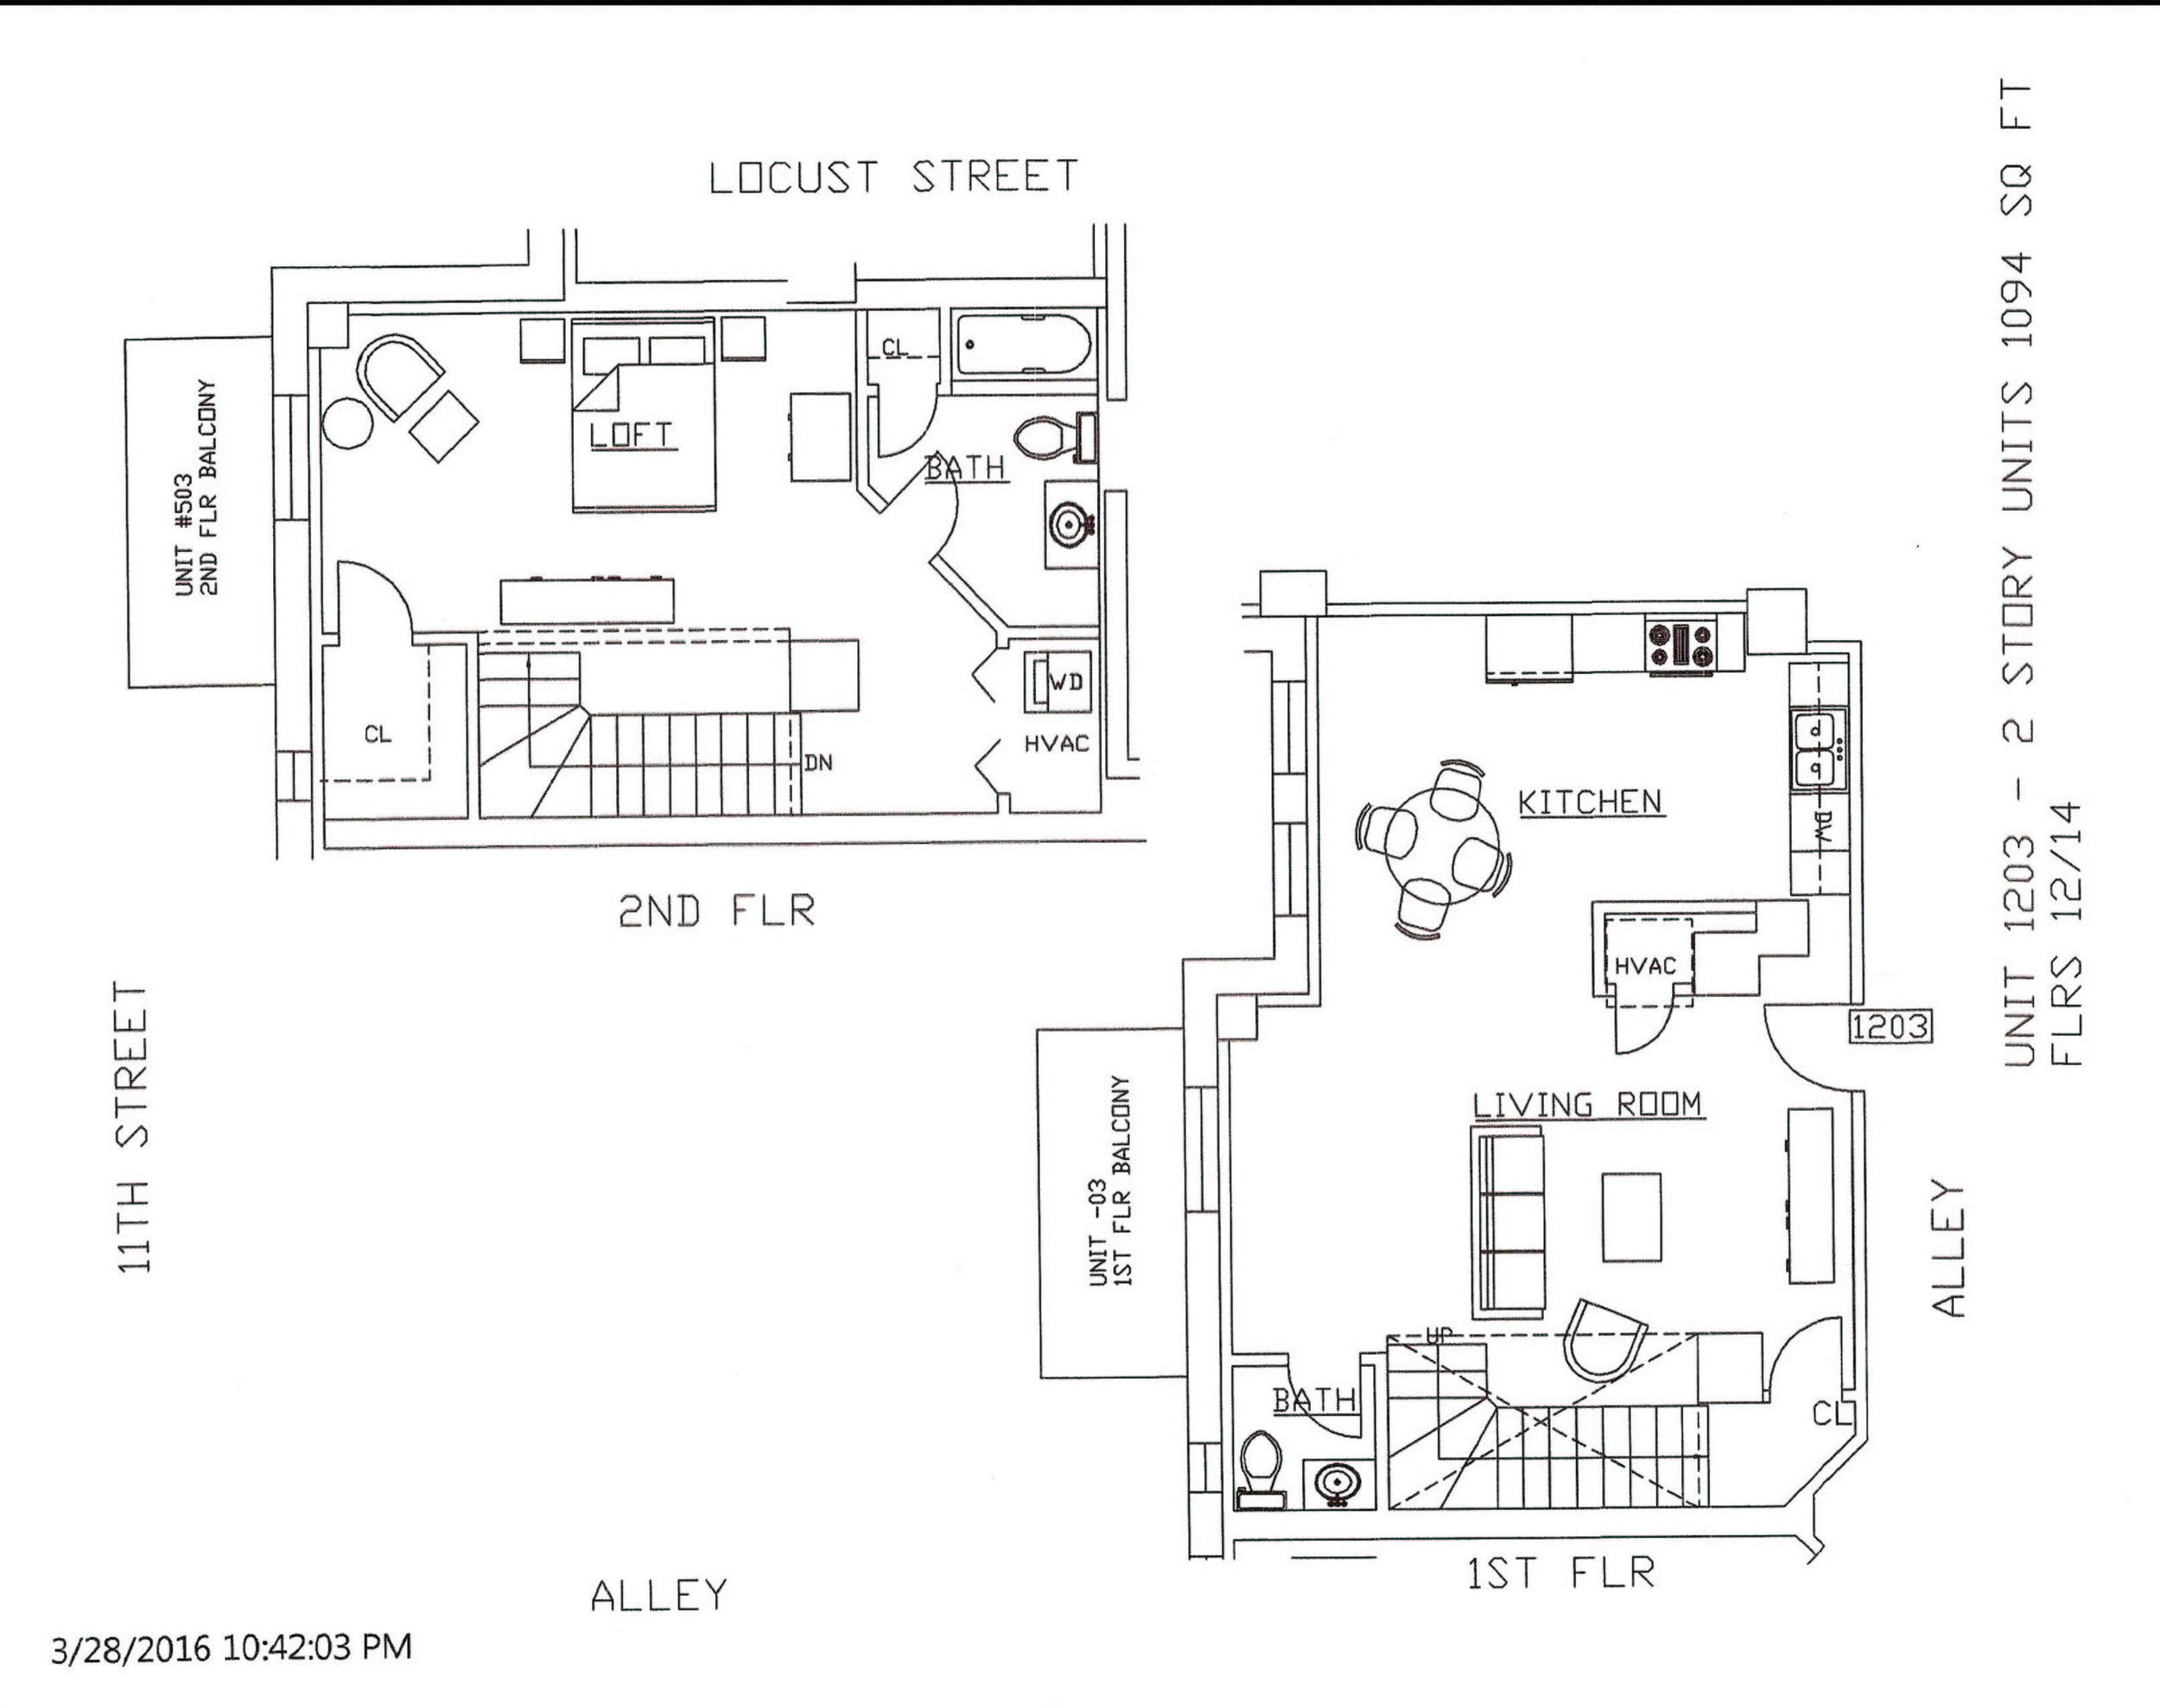 Unit 1203, 1094 Square Feet